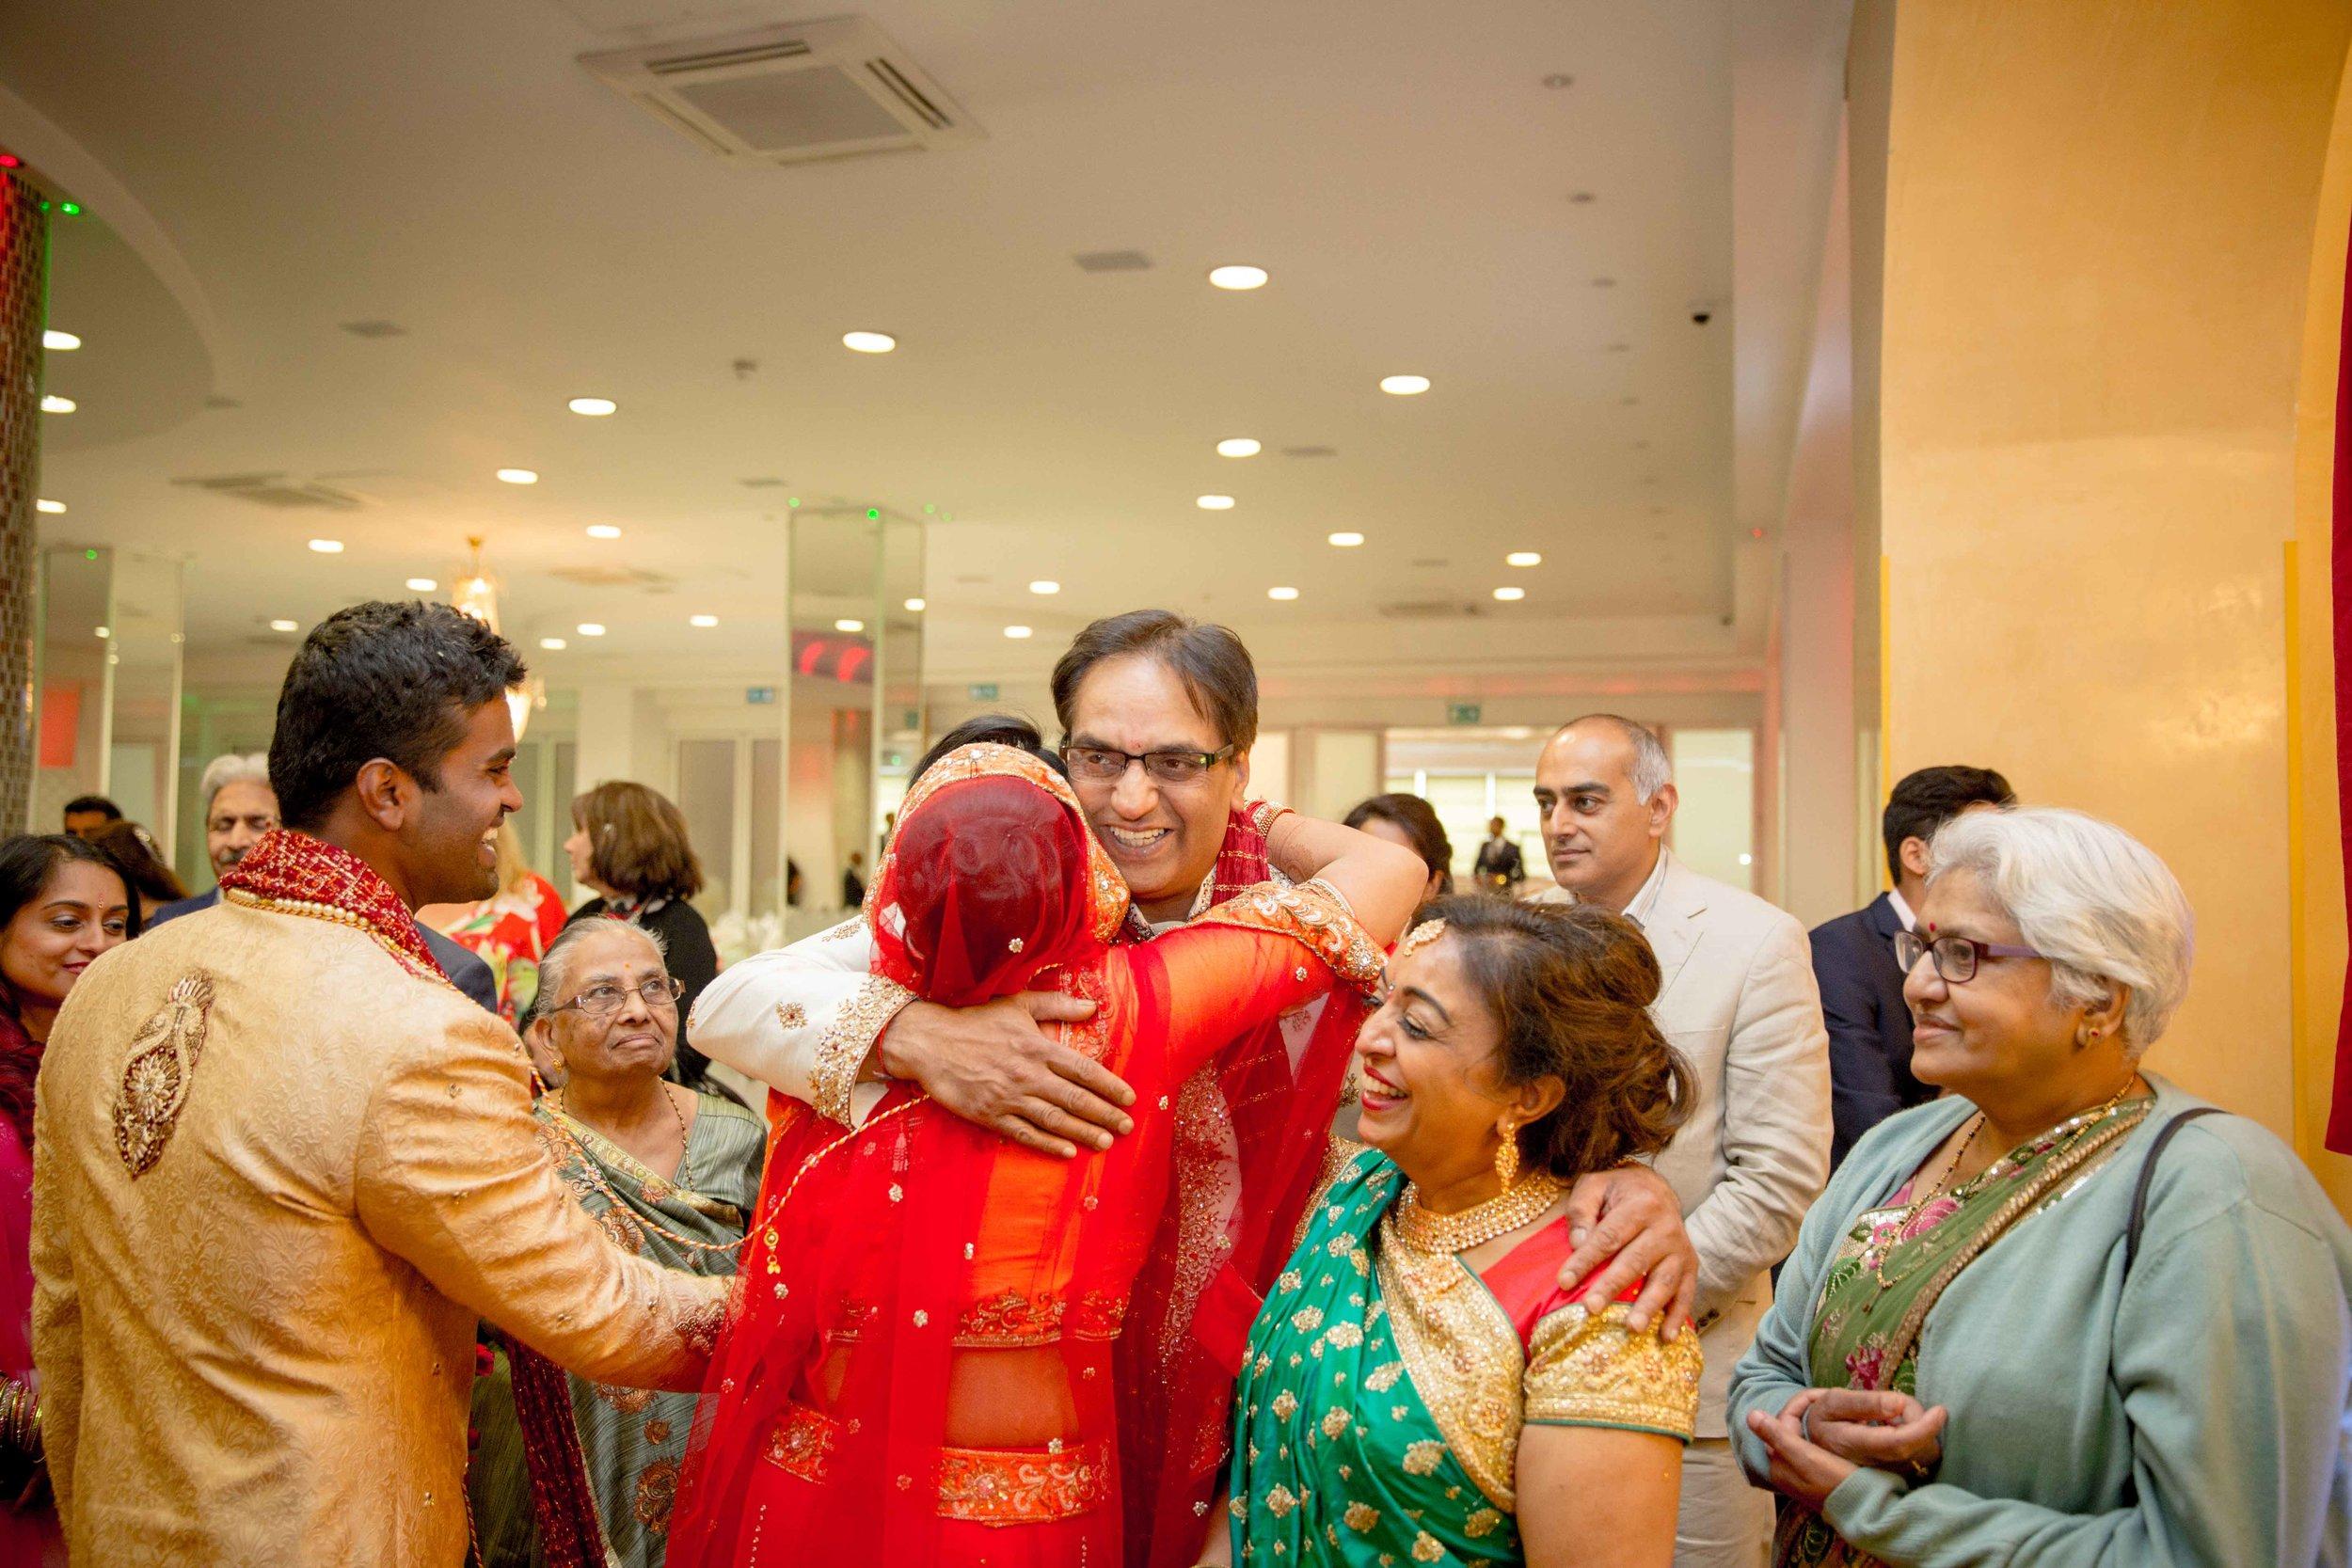 premier-banquetting-london-Hindu-asian-wedding-photographer-natalia-smith-photography-46.jpg